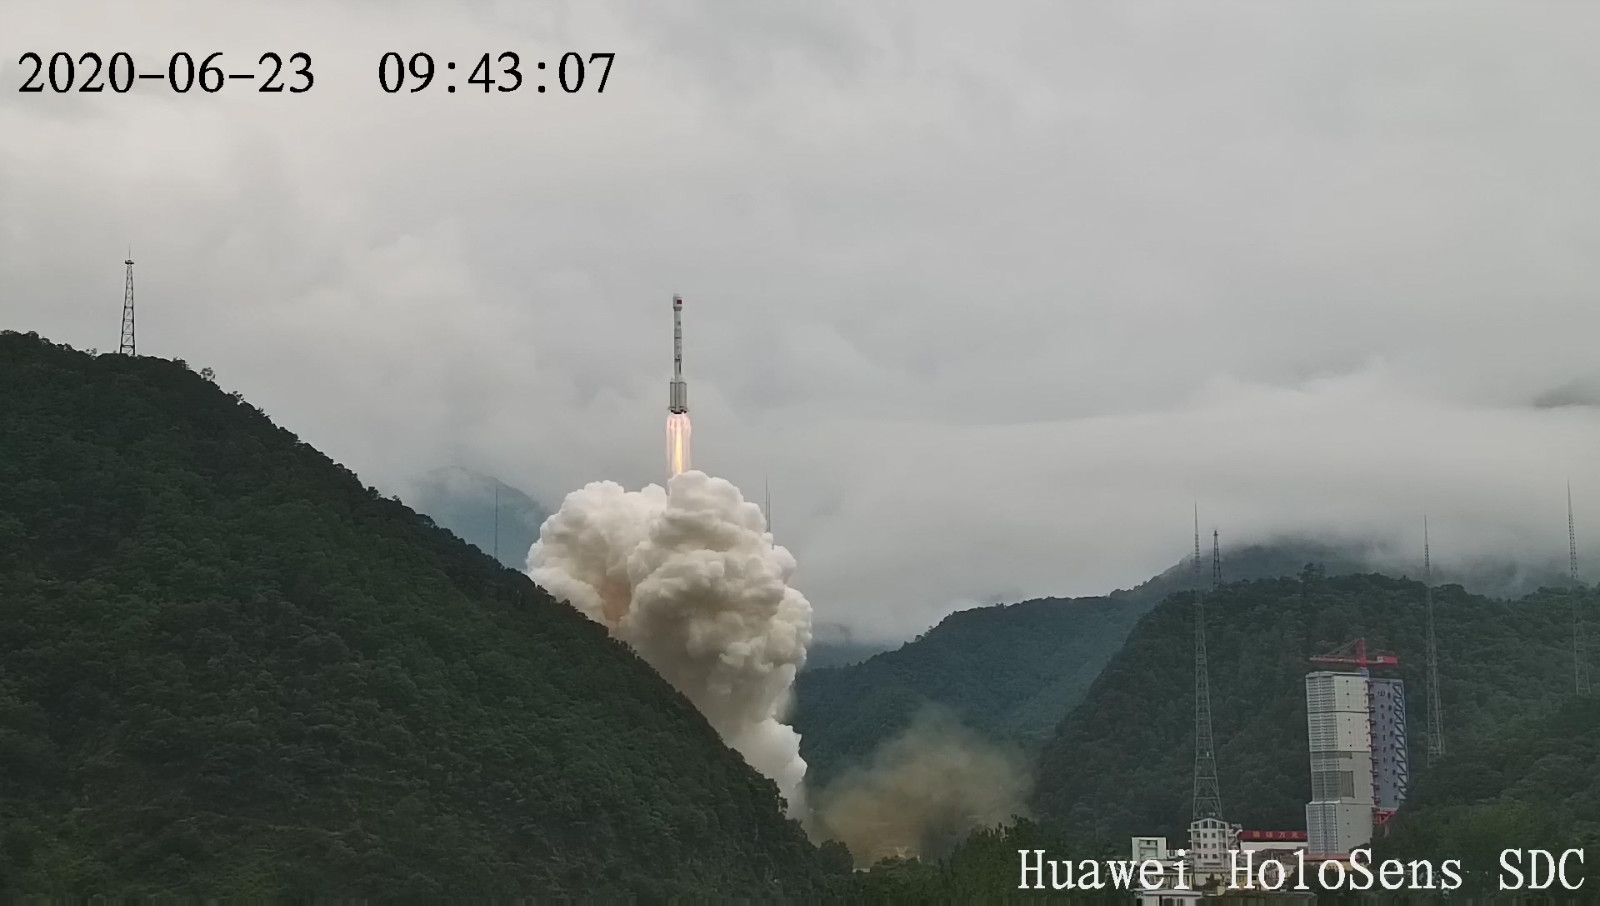 Huawei HoloSens SDC 见证北斗三号卫星发射